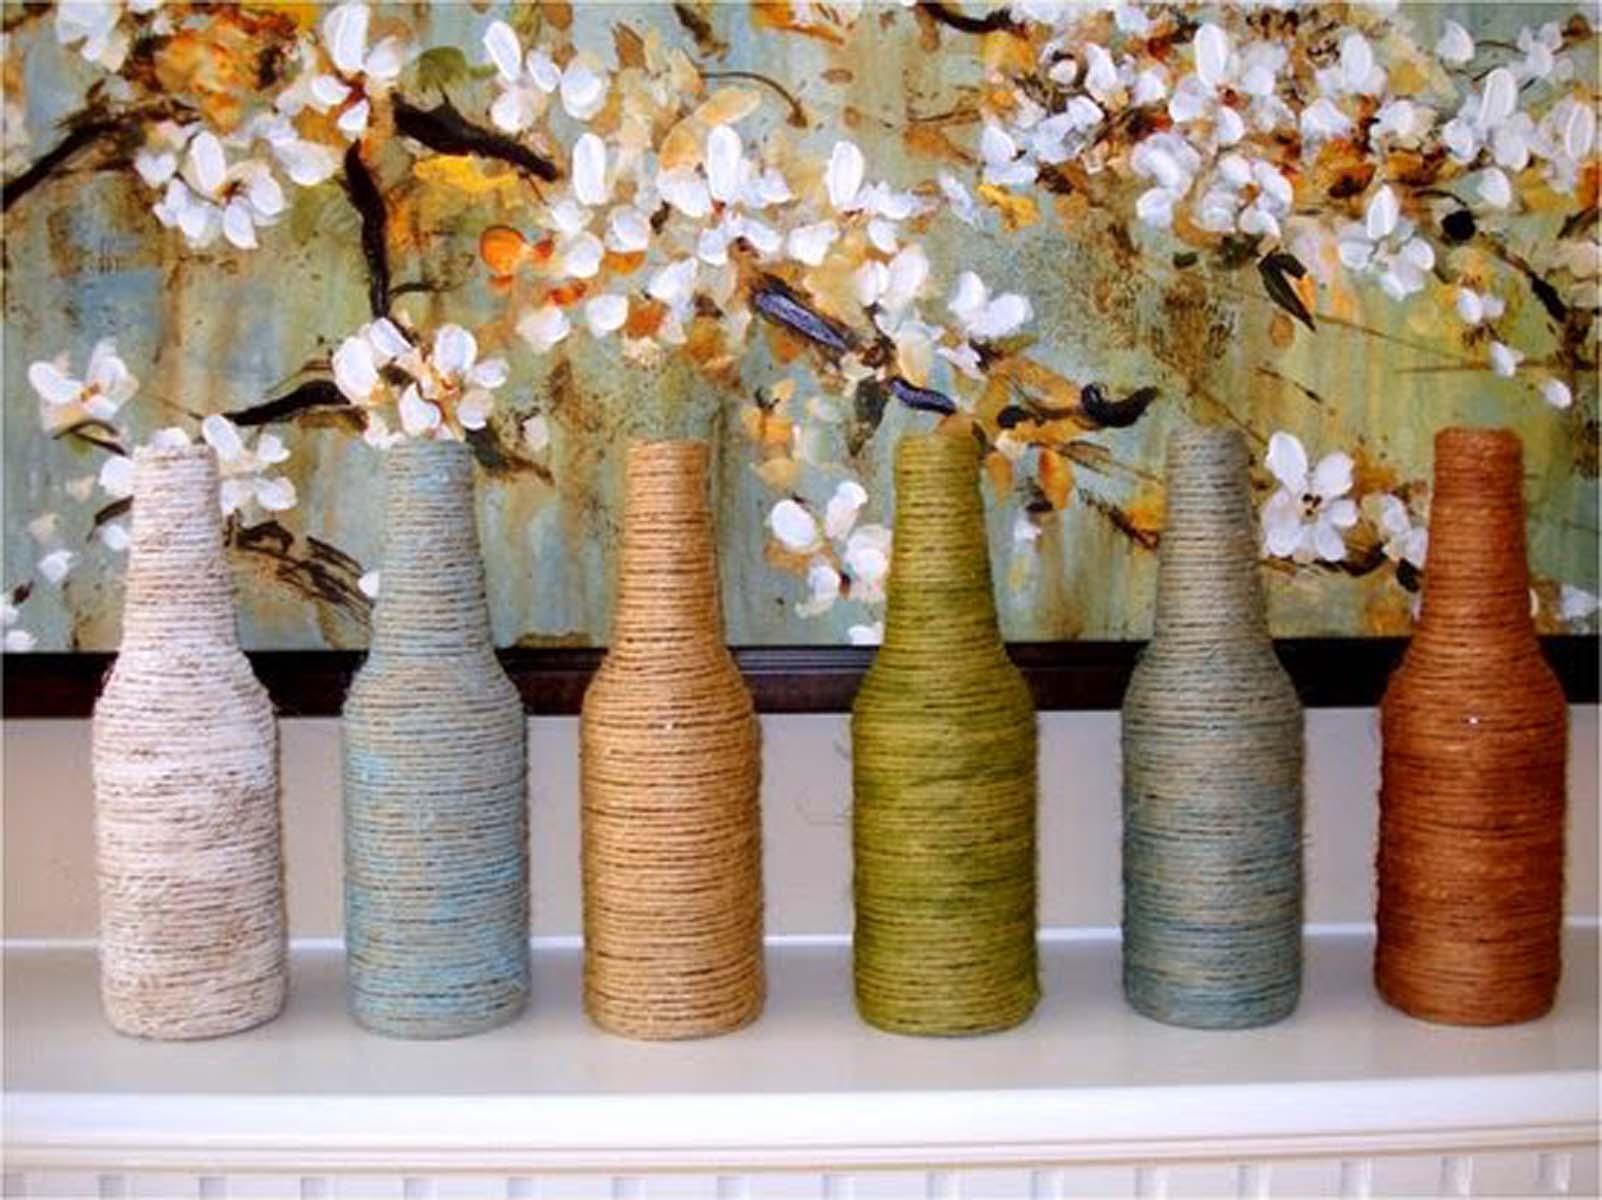 detalles-boda-material-reciclado2